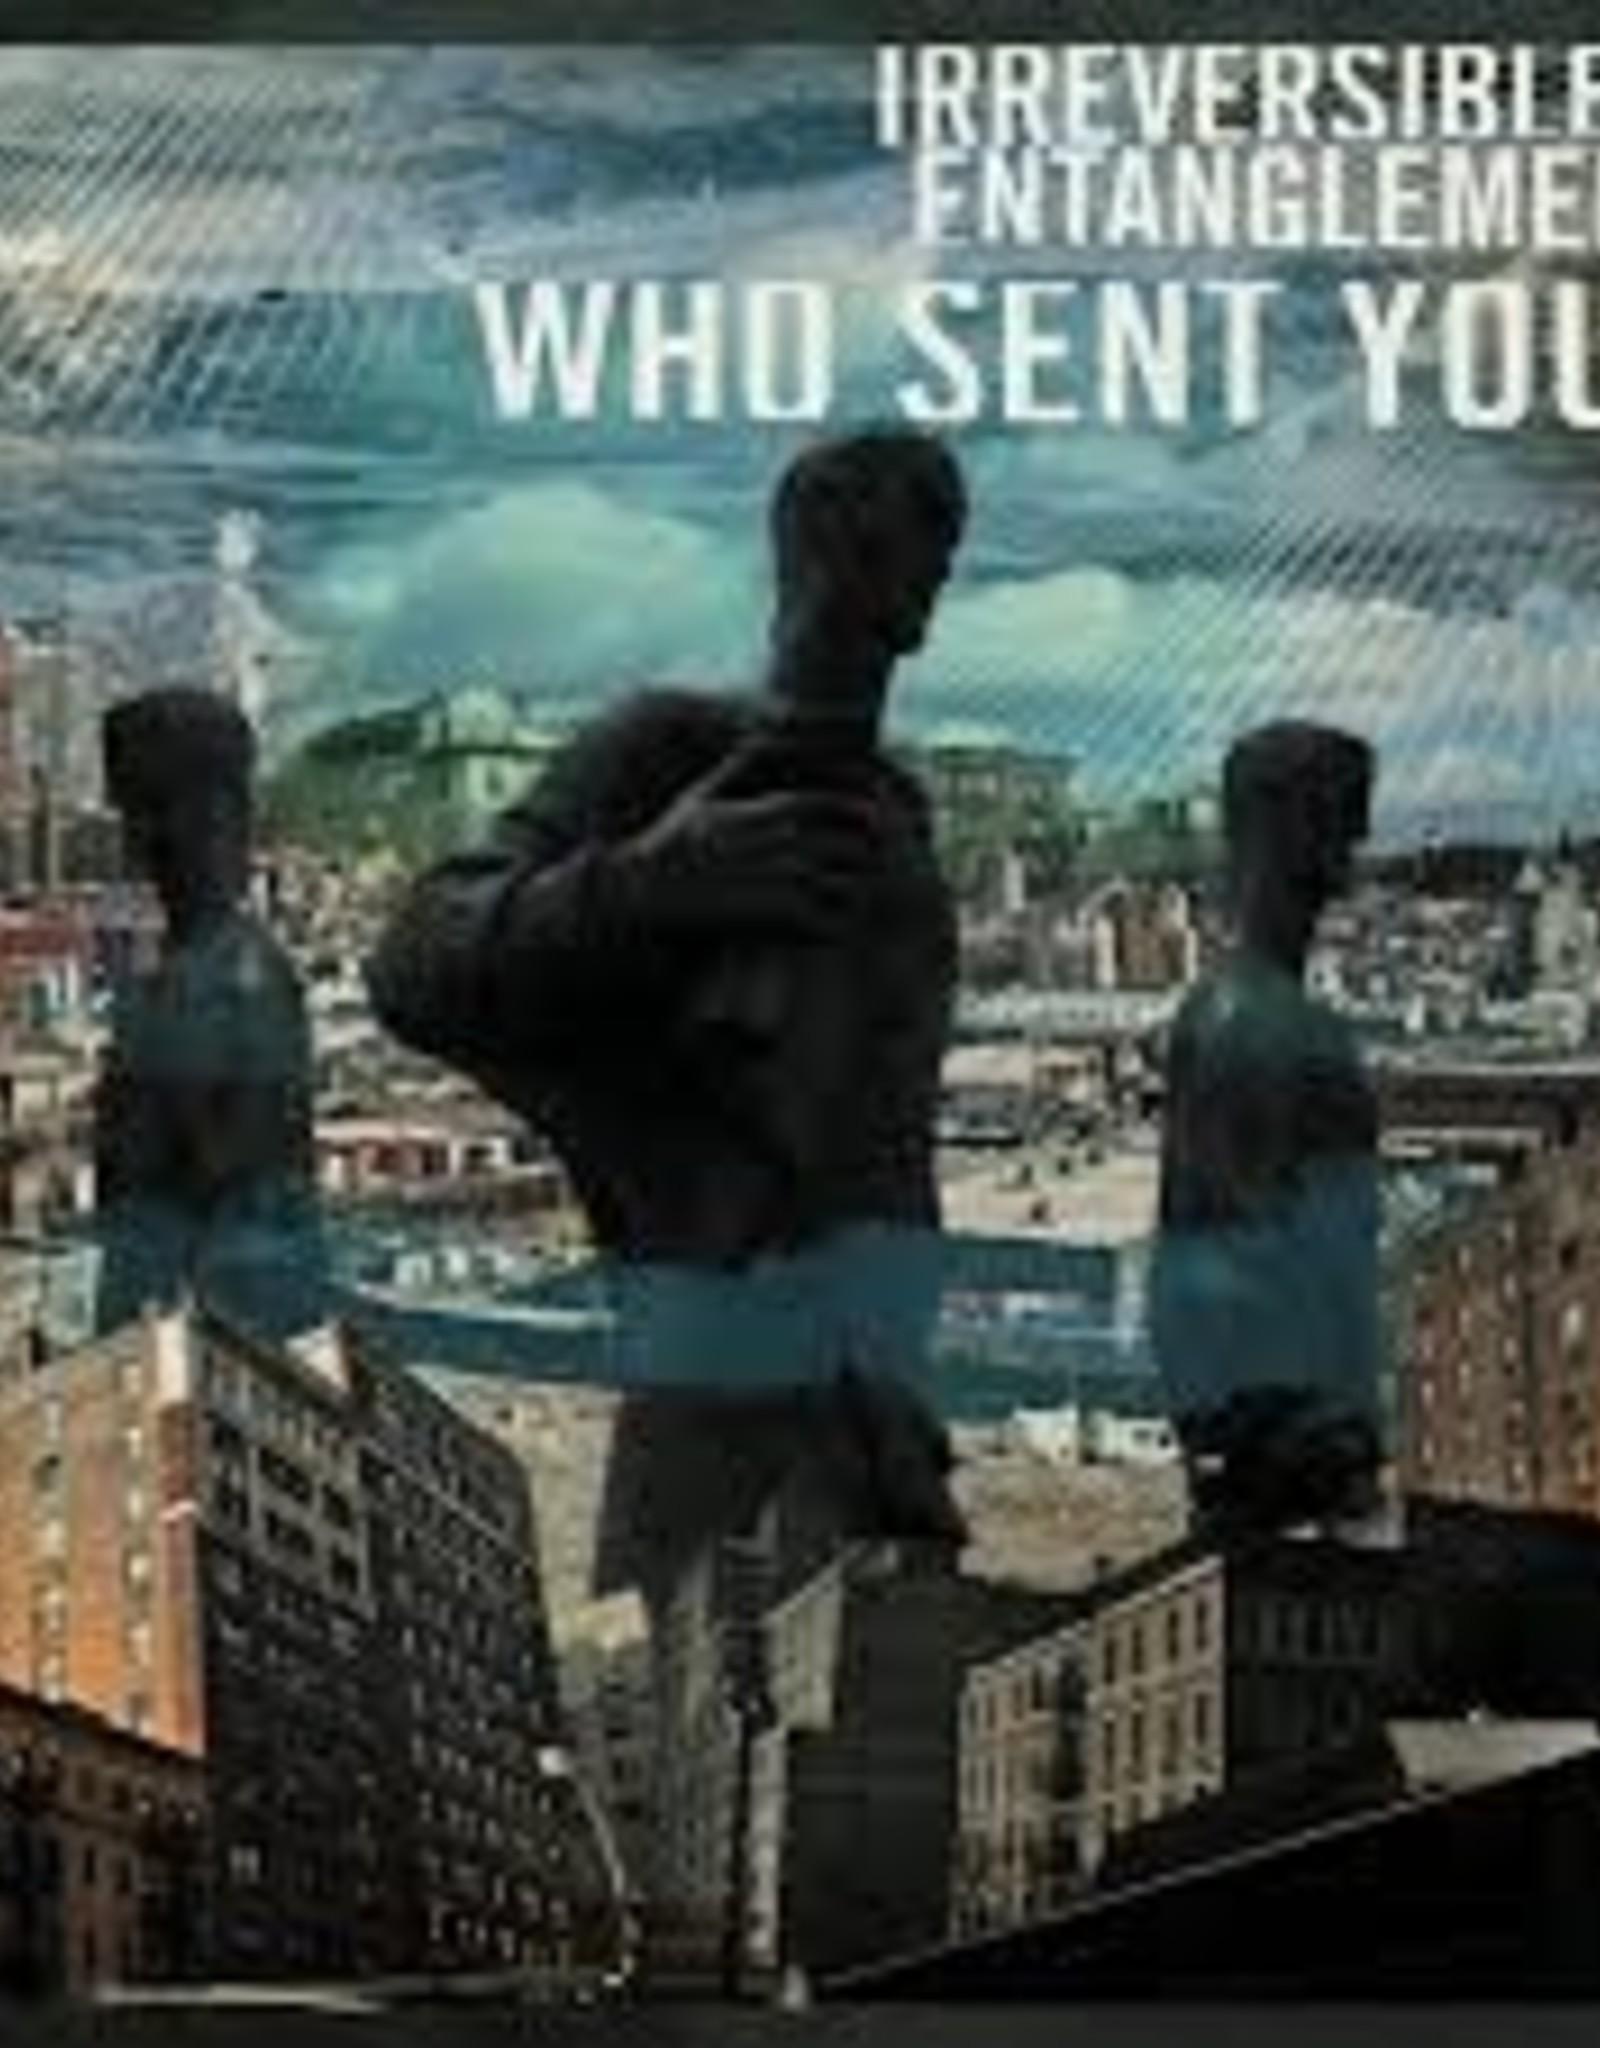 Irreversible Entanglements - Who Sent You?